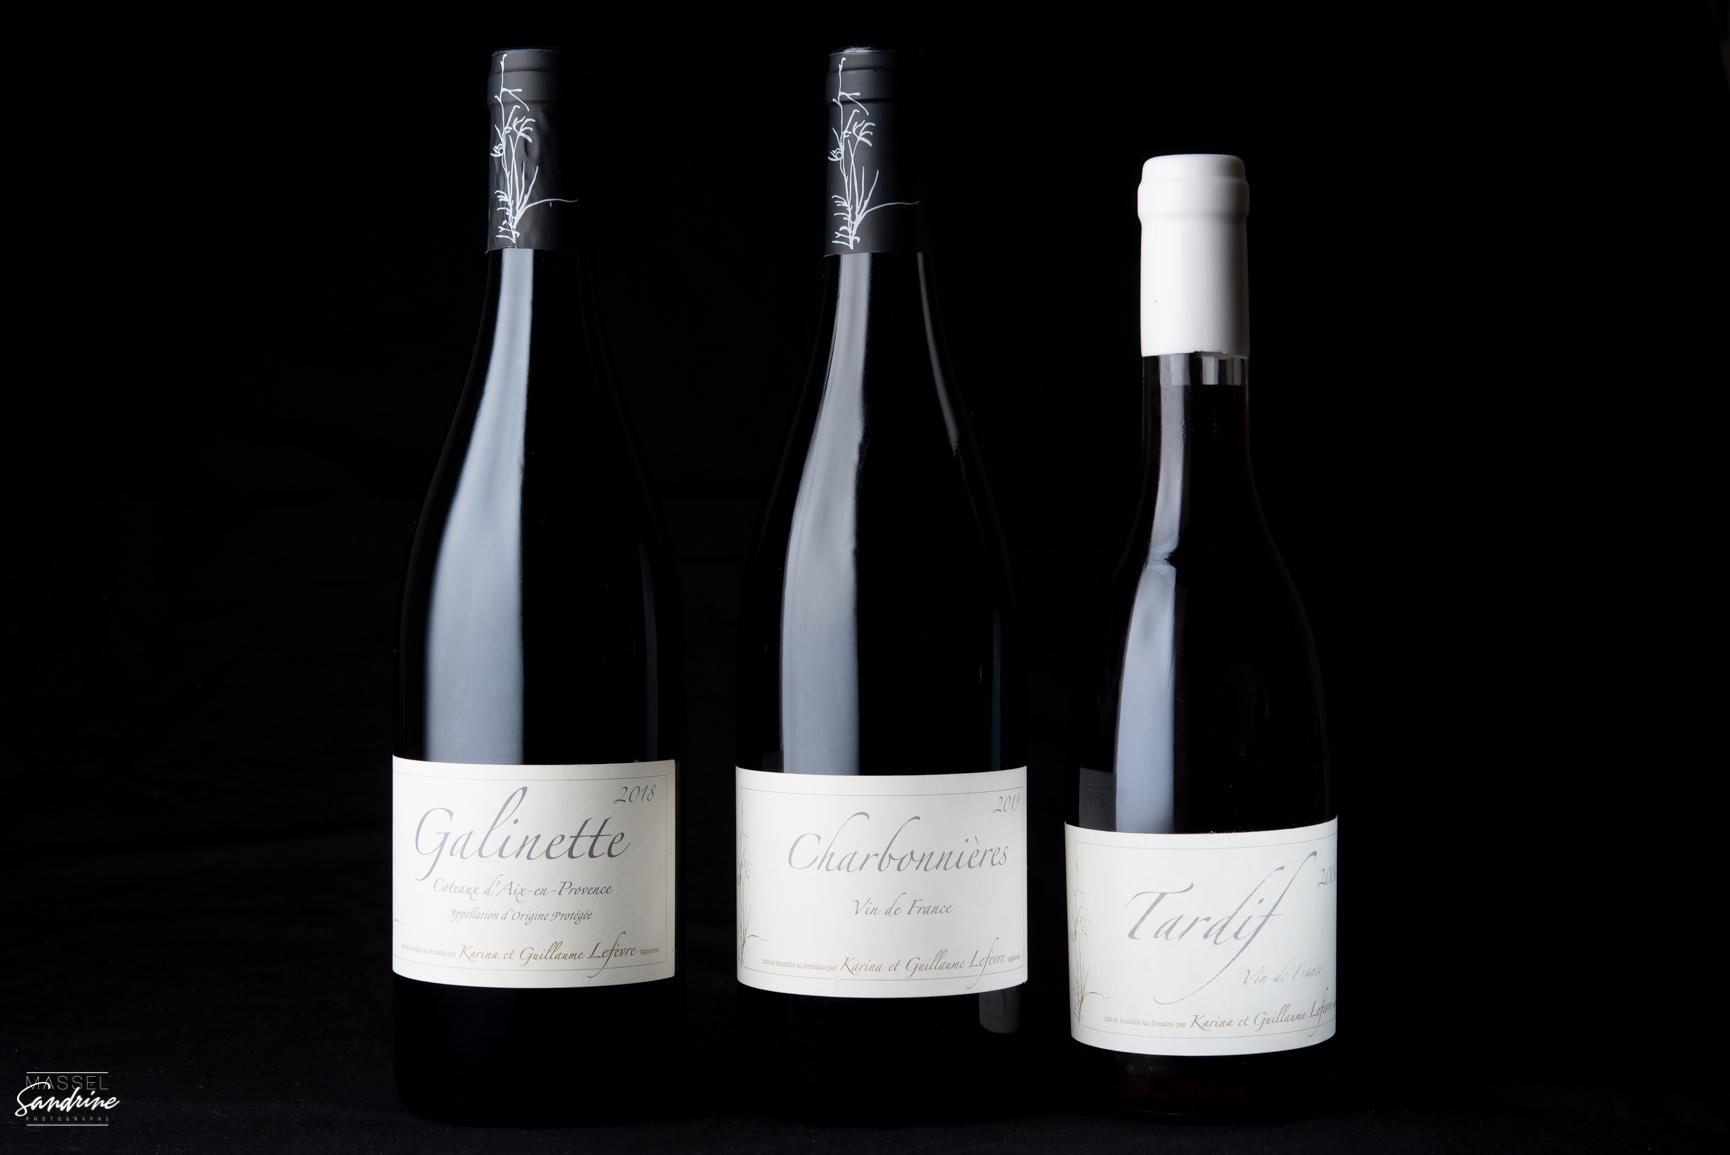 sandrine-massel-photographe-reportage-communication-vins-bieres-spiritueux-paca